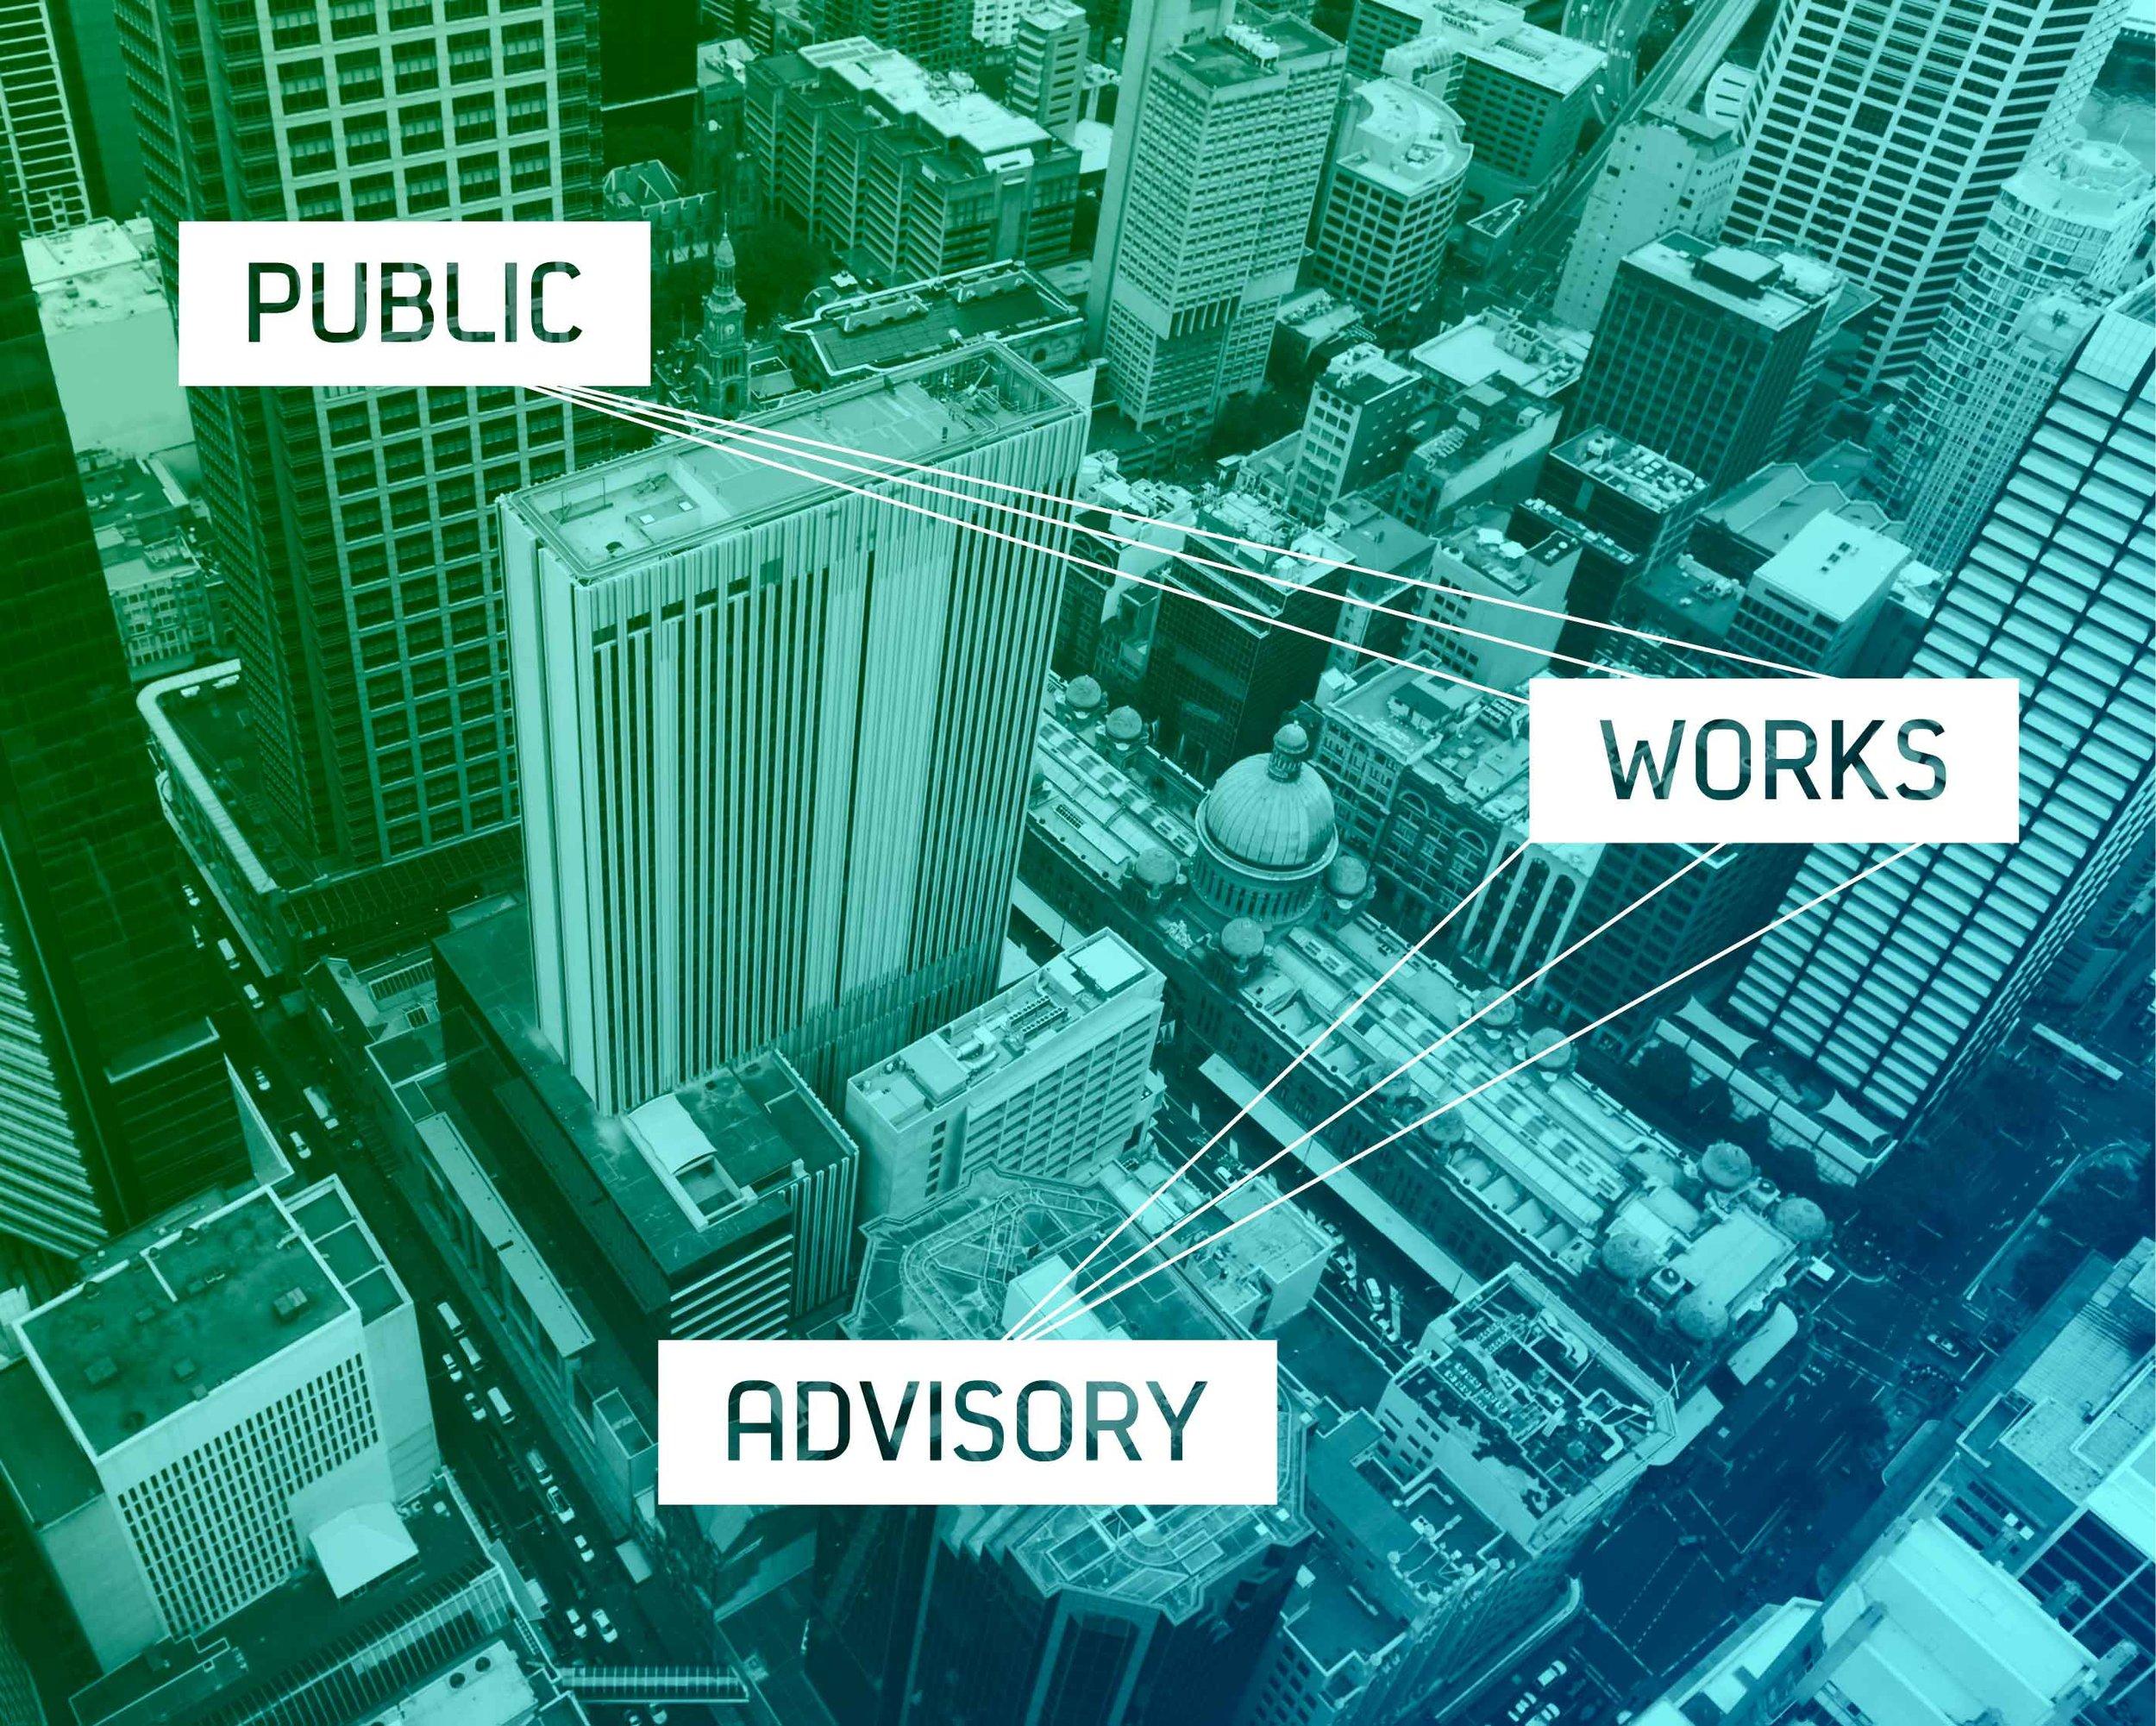 Client Work - Public Works Advisory